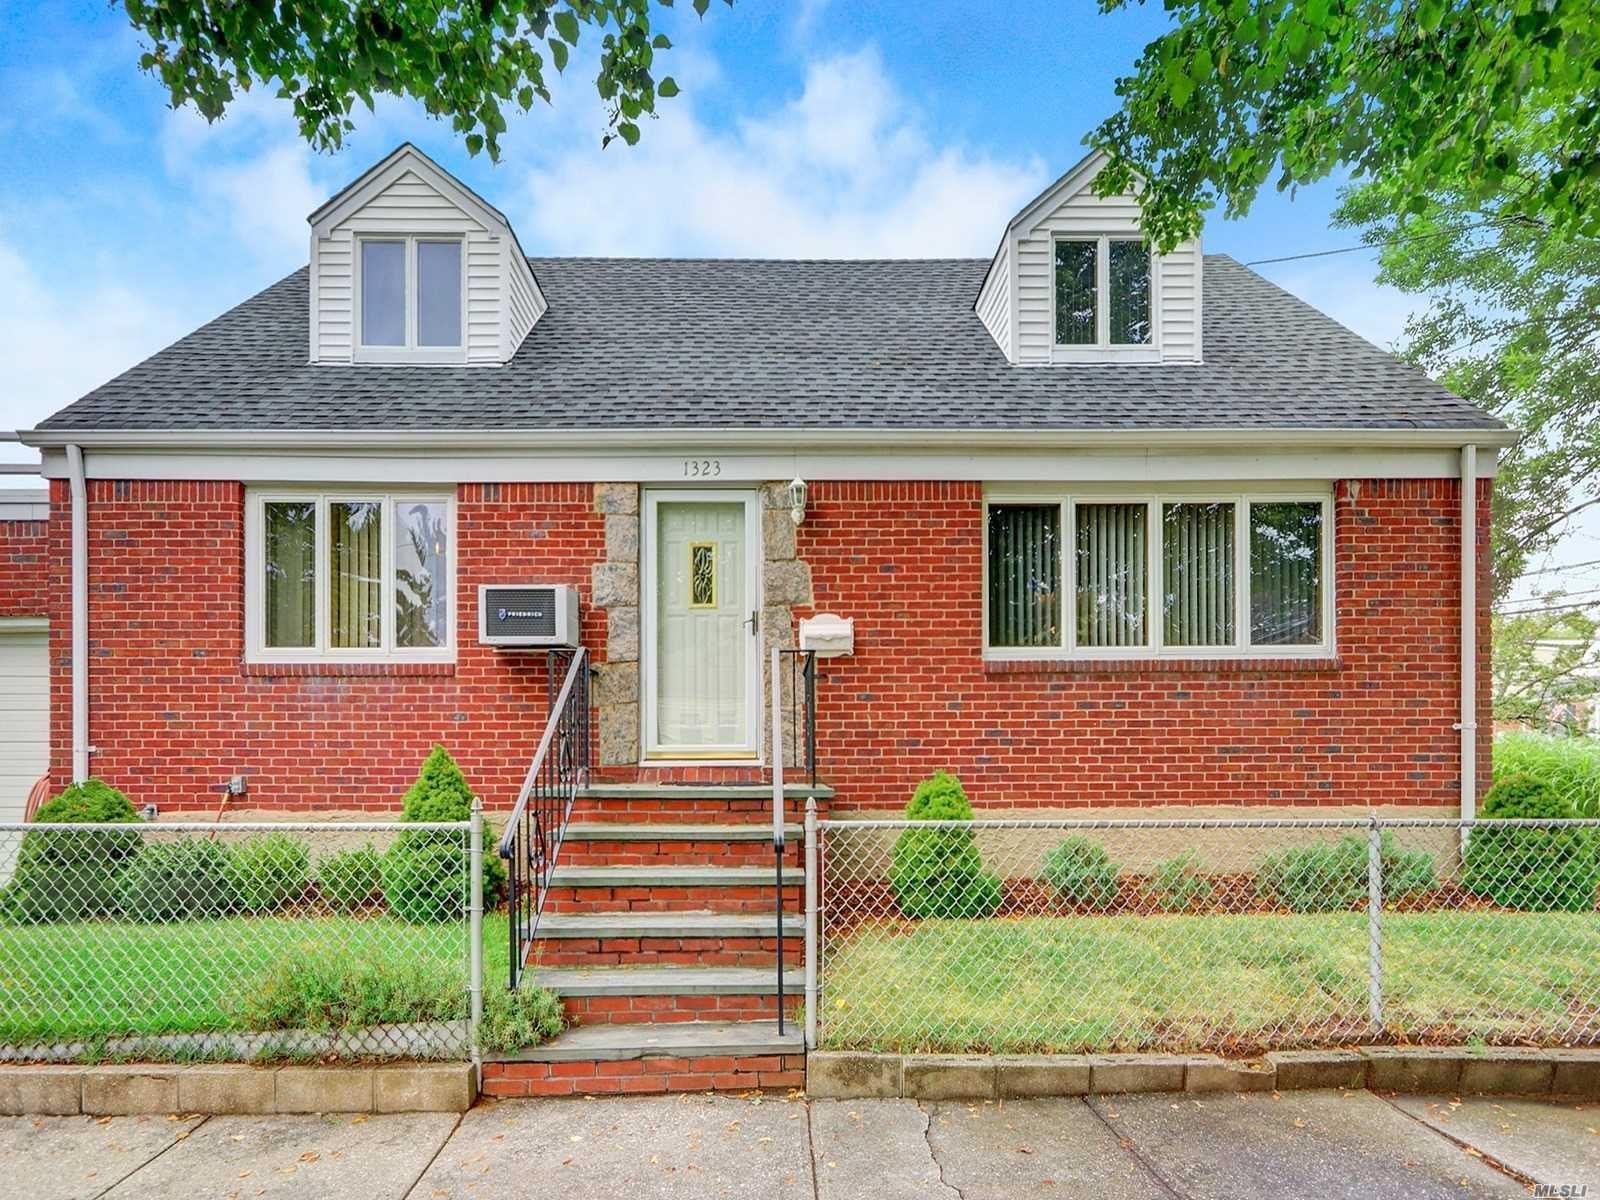 1323 Lowell Ave, New Hyde Park, NY 11040 - MLS#: 3239841